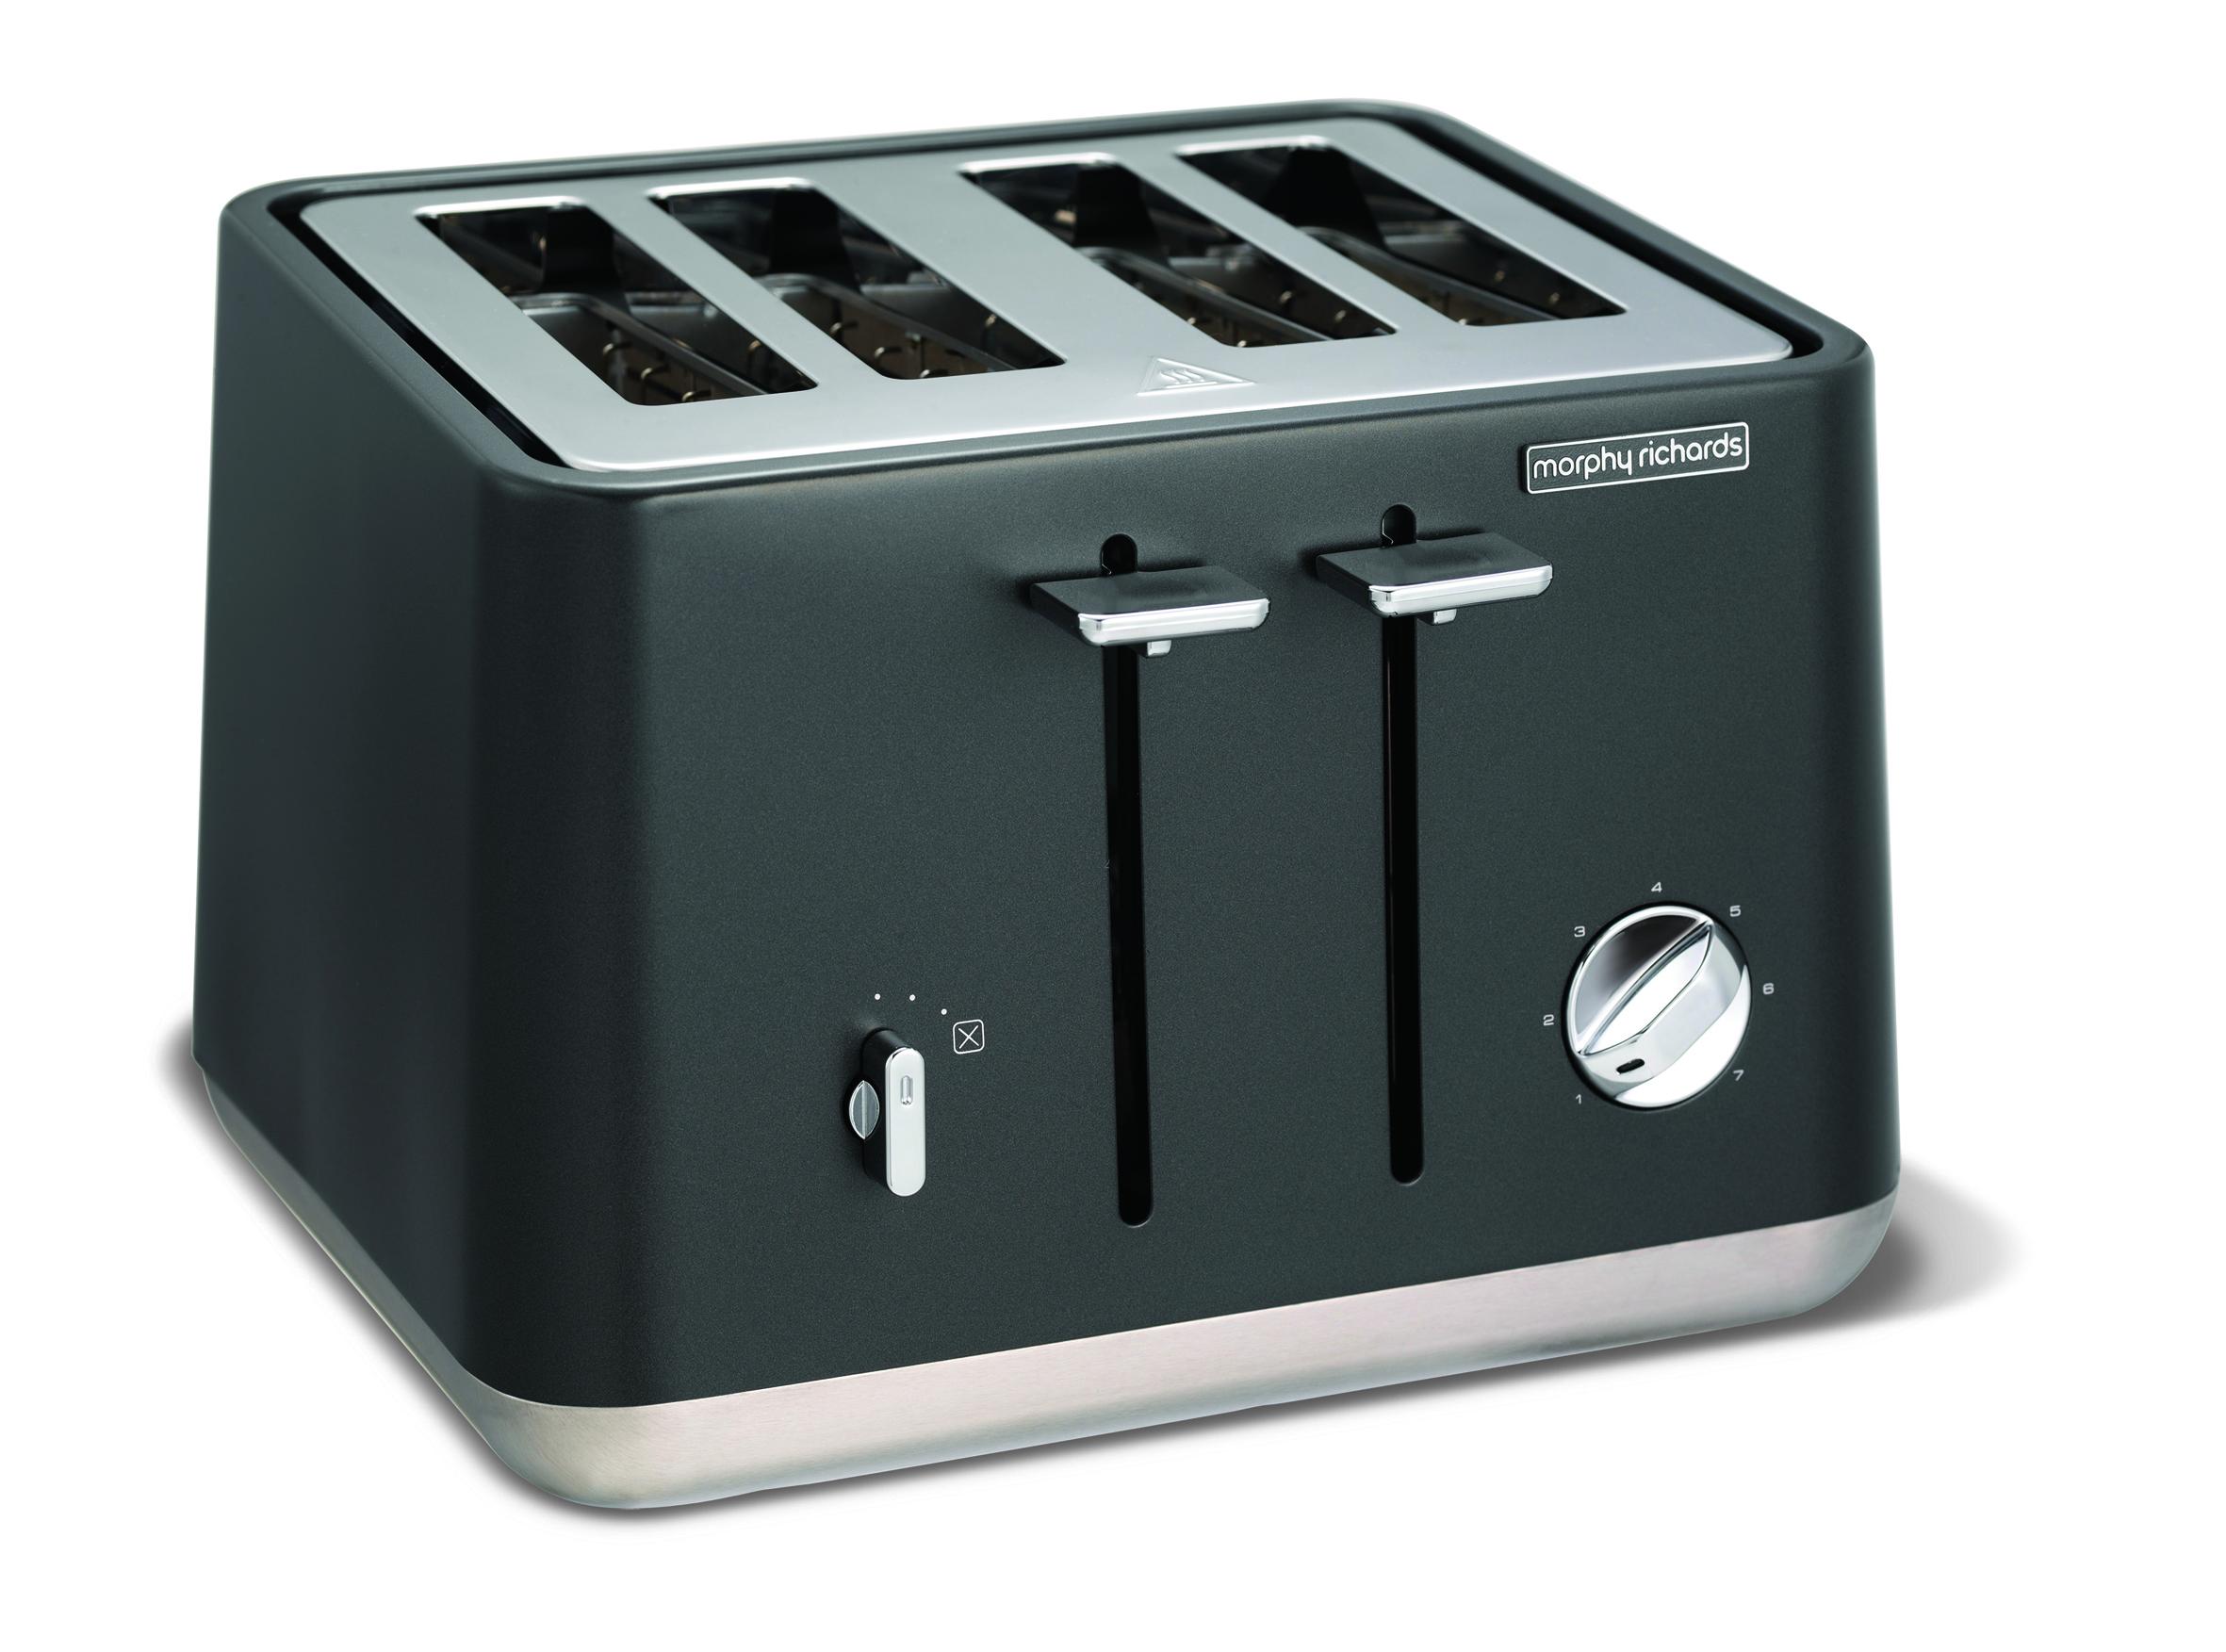 morphy richards toaster aspect mit vier toastkammern. Black Bedroom Furniture Sets. Home Design Ideas